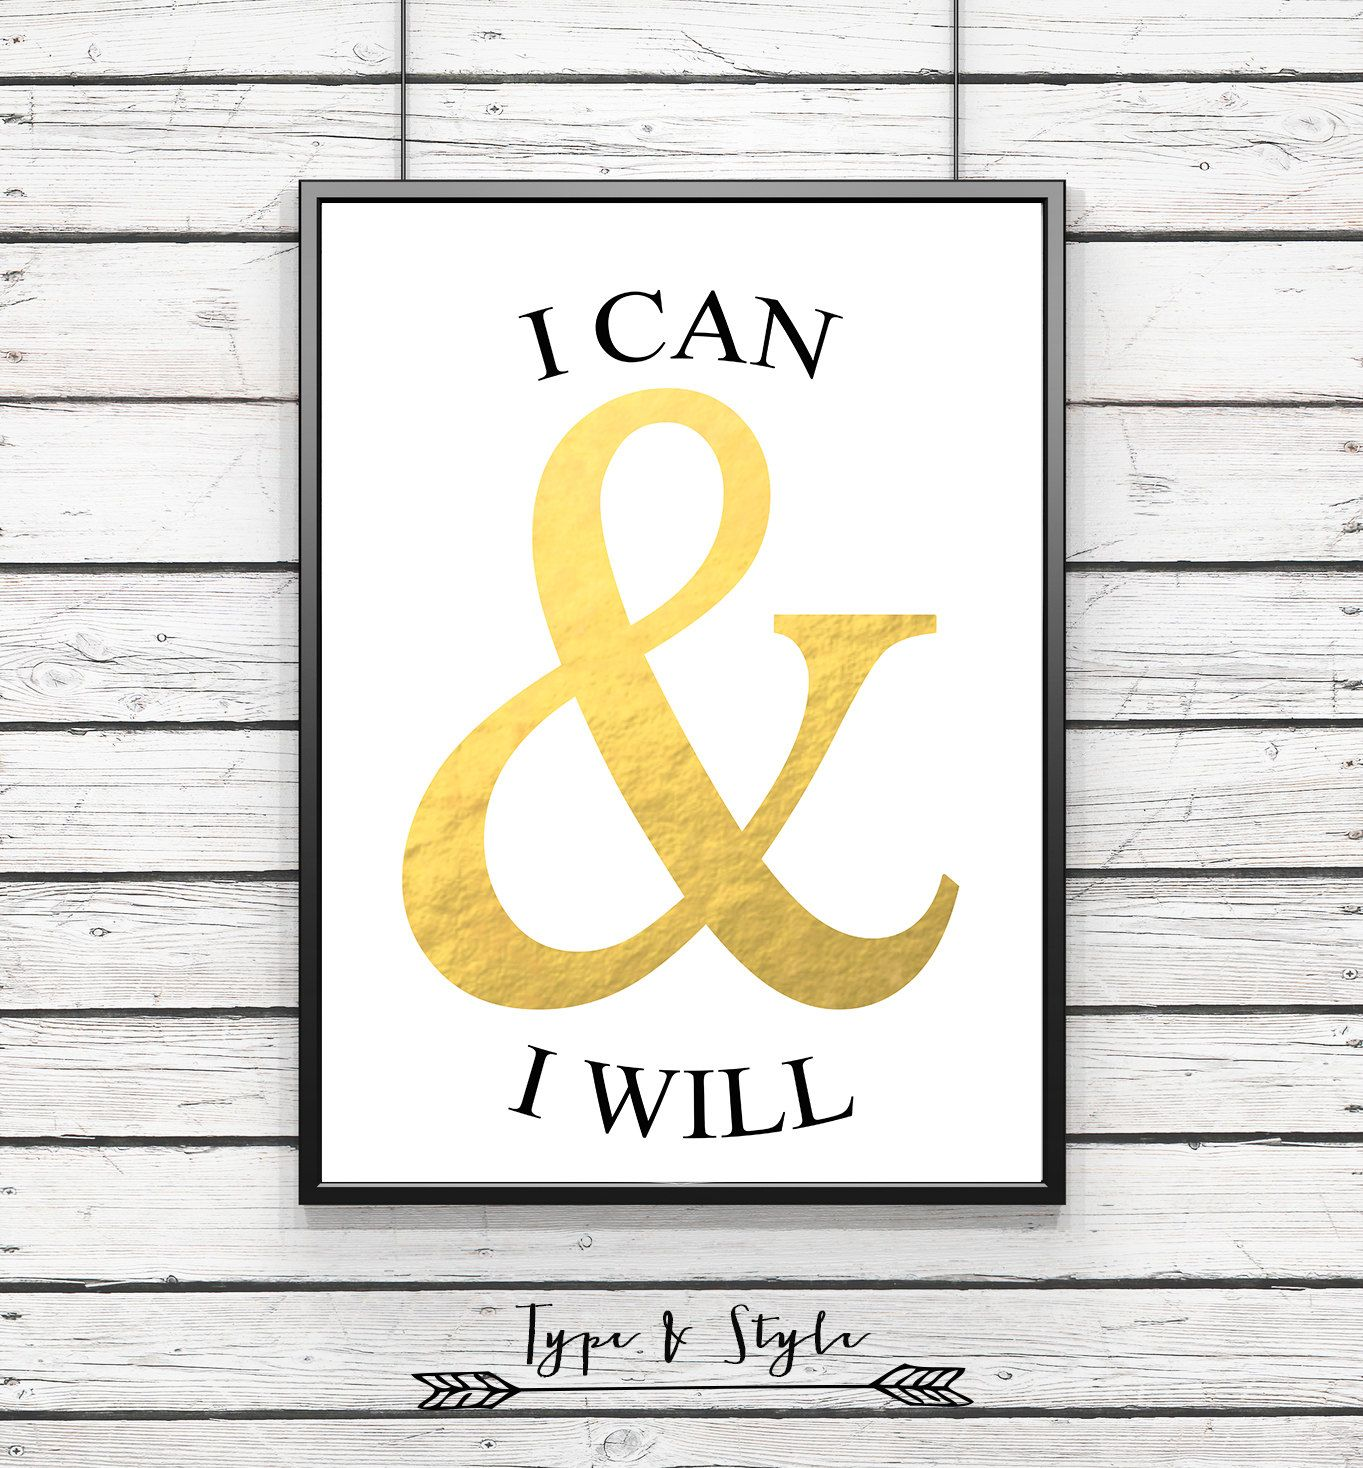 I can and Will Gold Ampersand Framed Poster - Framed Digital Art ...